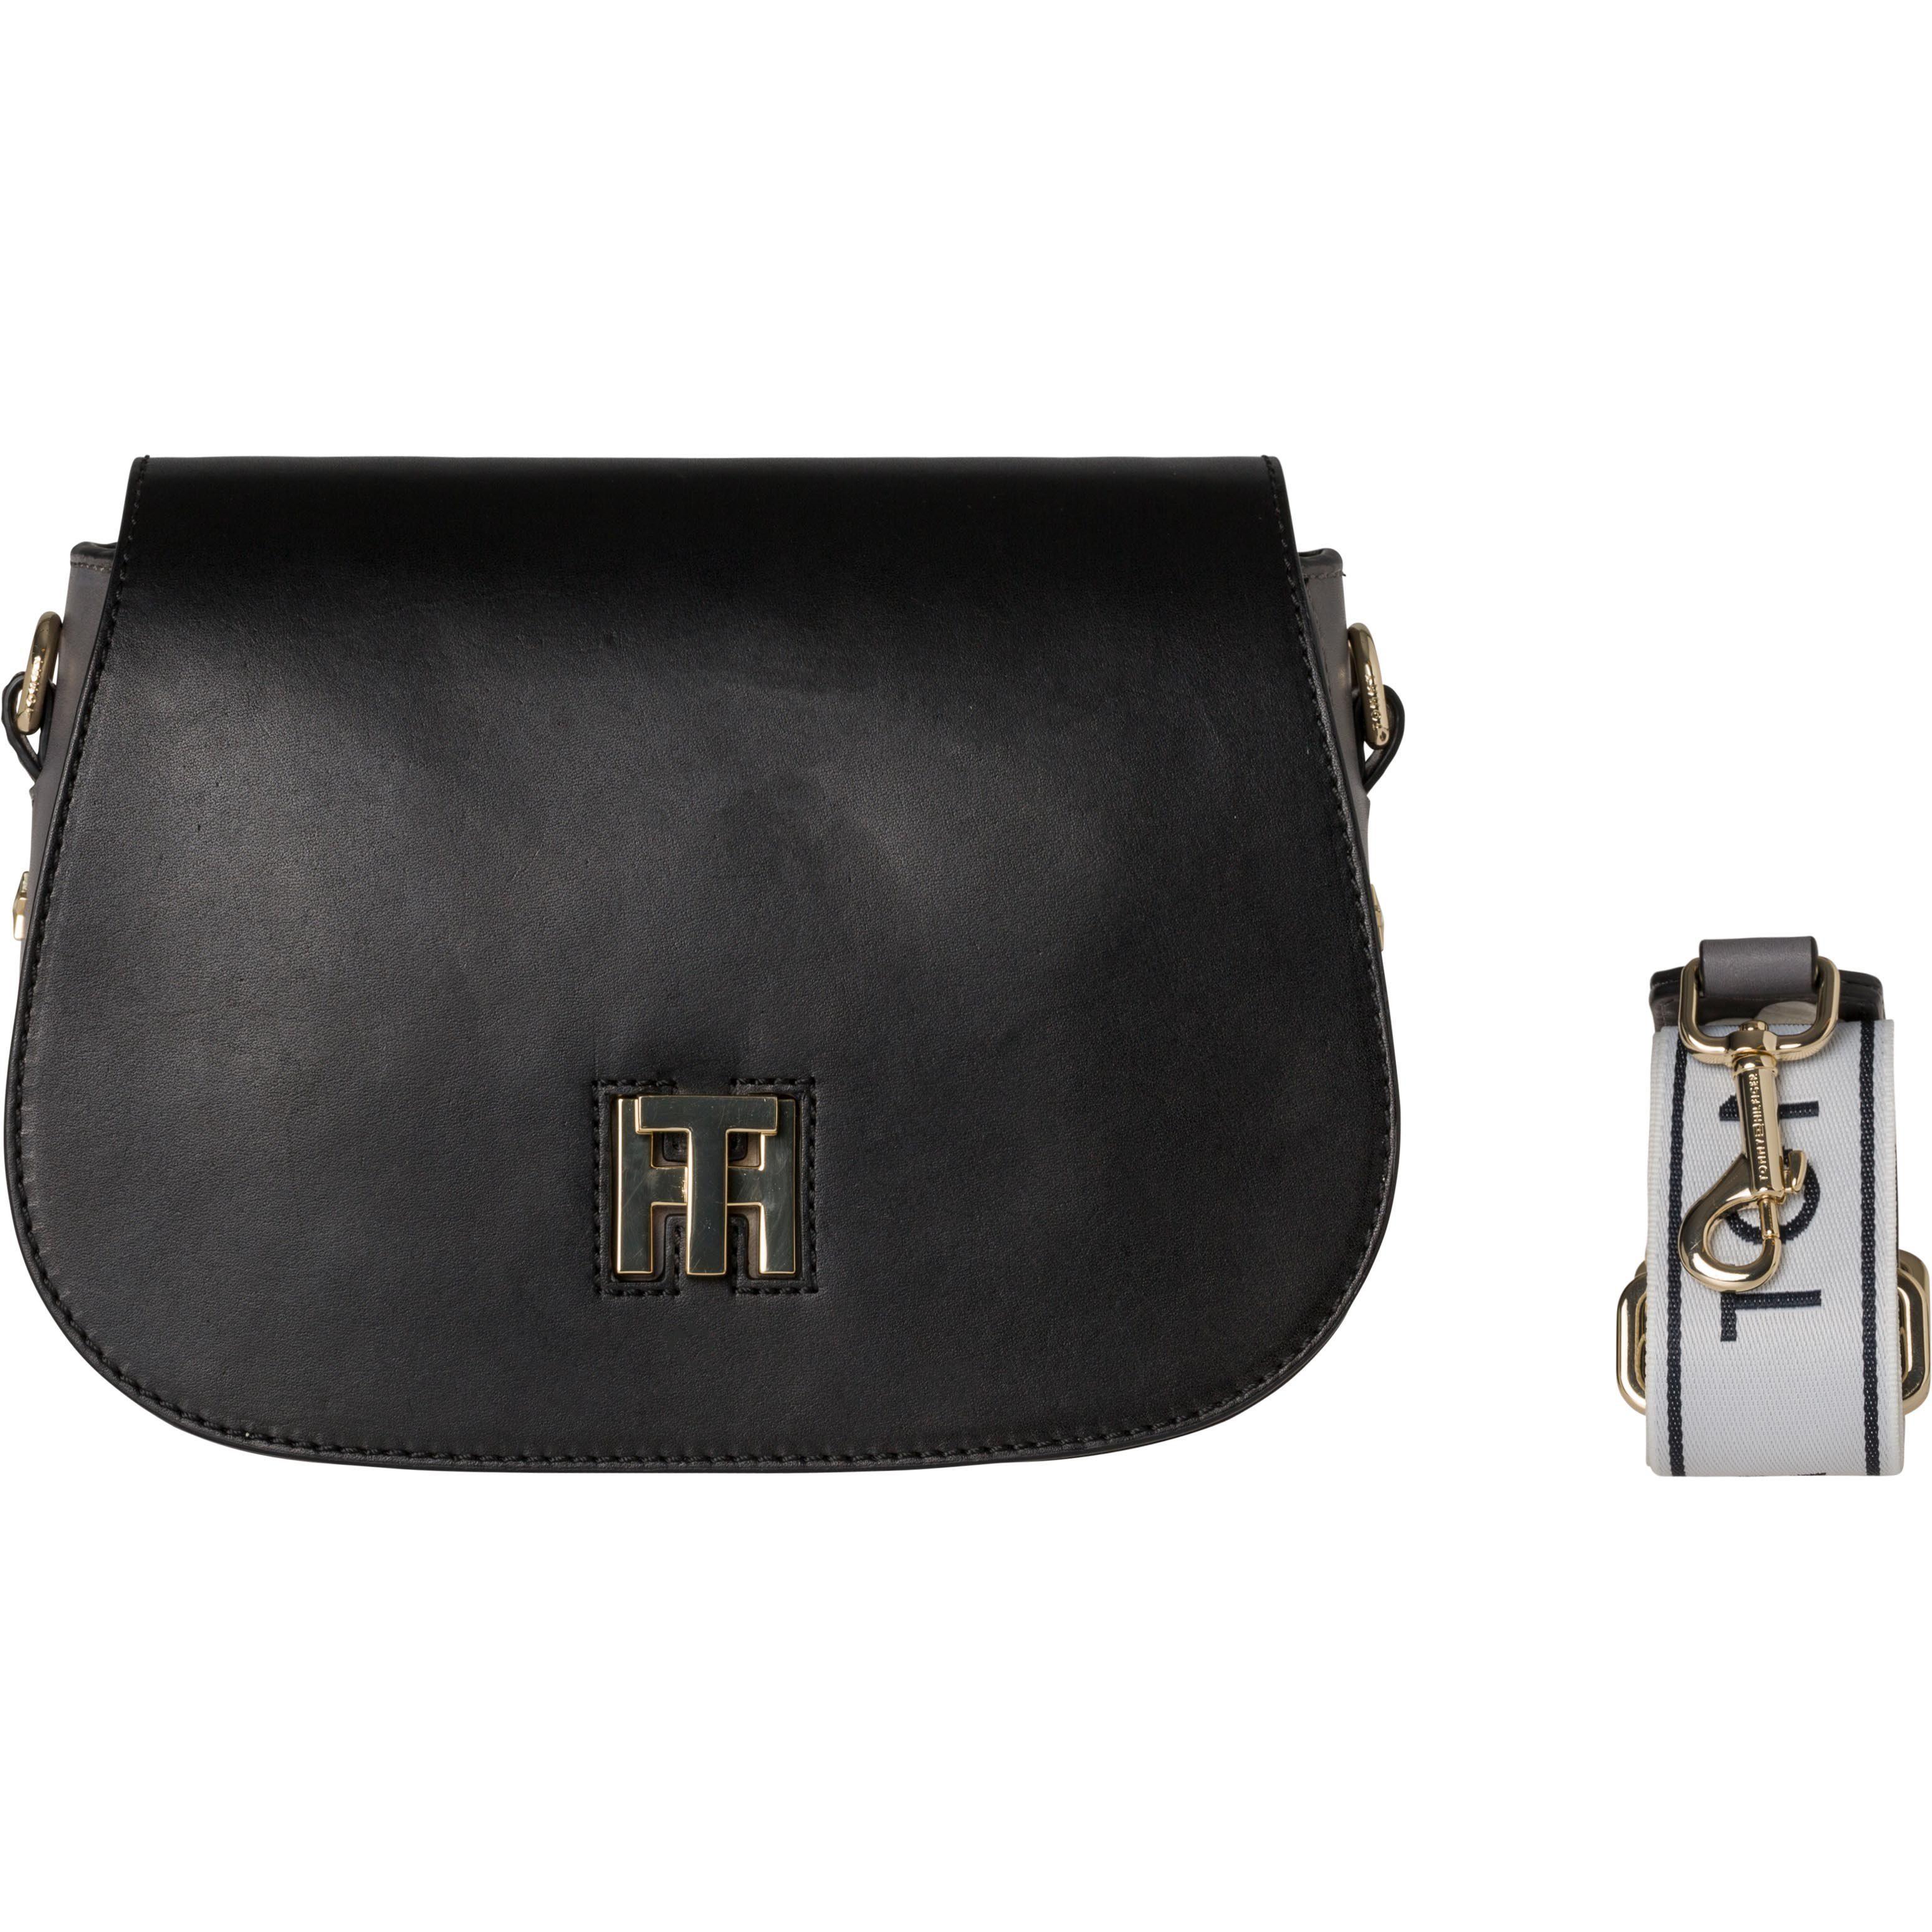 Tommy Hilfiger Handtaschen »TH TWIST SADDLE BAG LOGO«